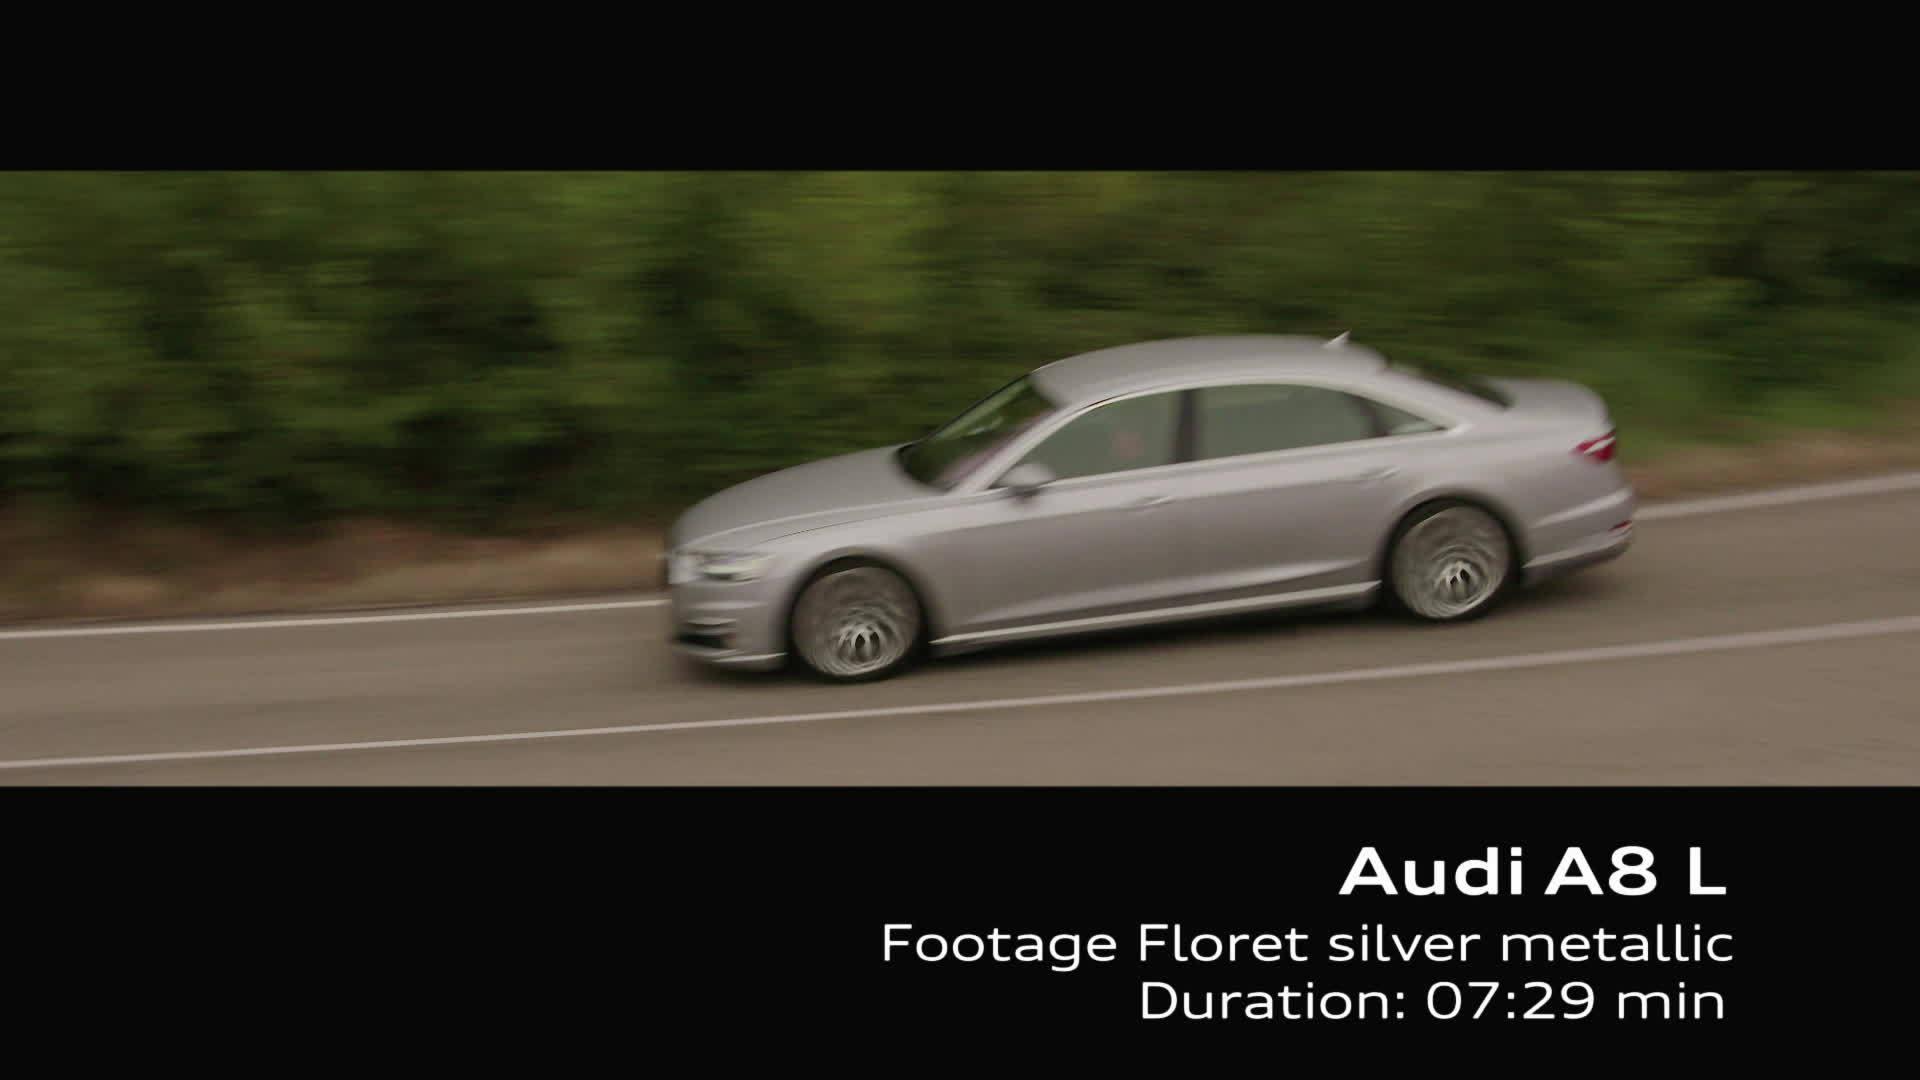 Footage Audi A8 L on Location